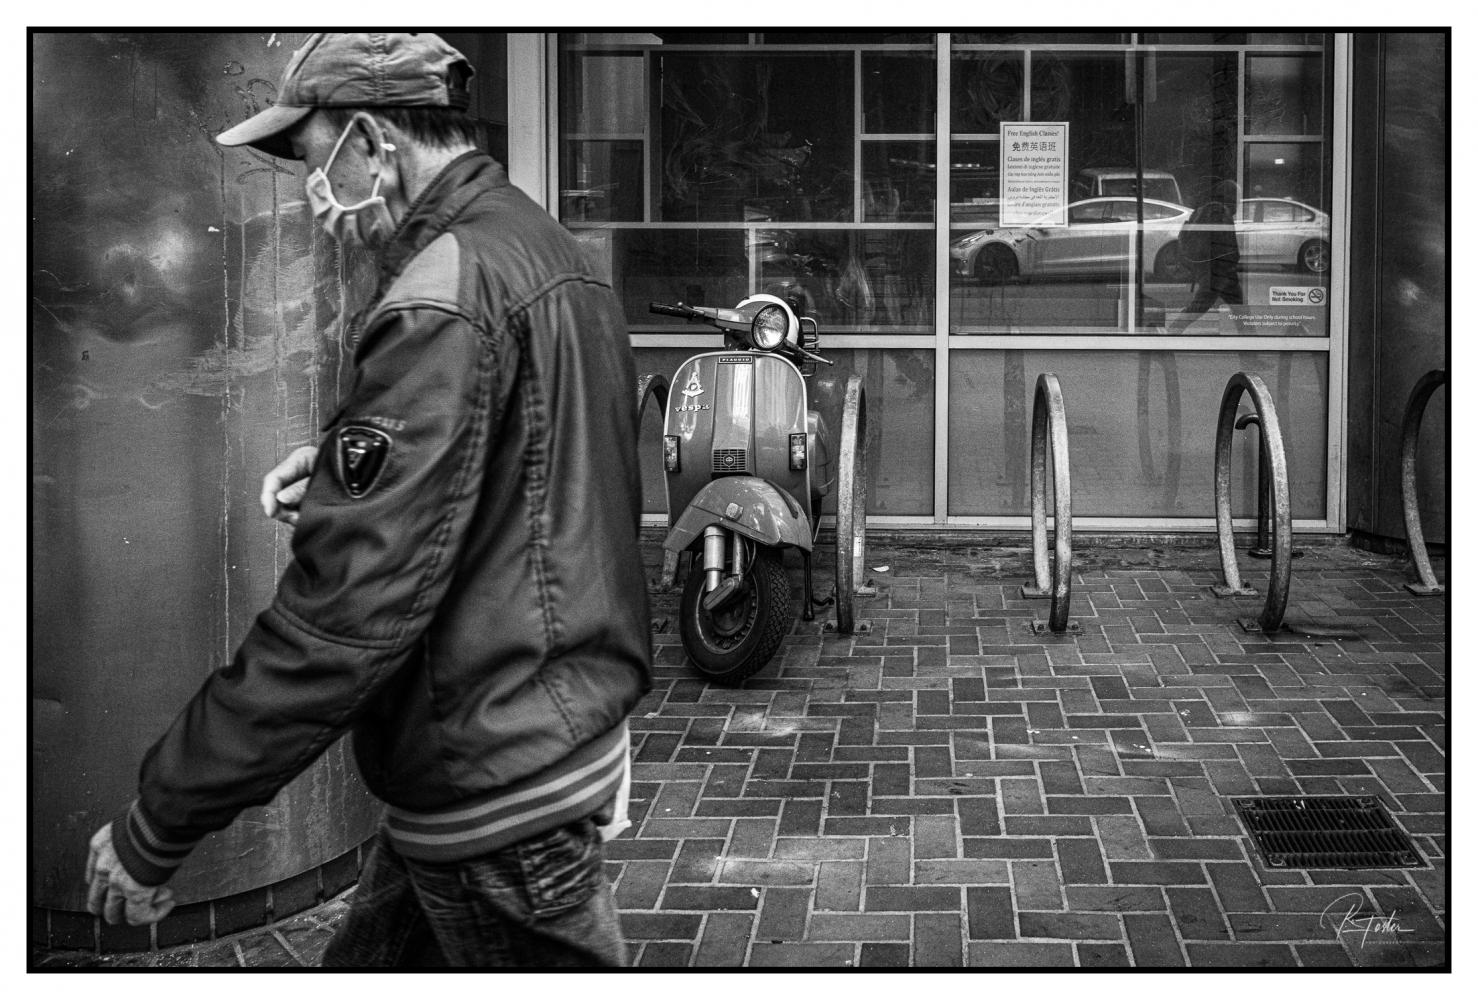 One Scooter, ©2021 Reginald Foster